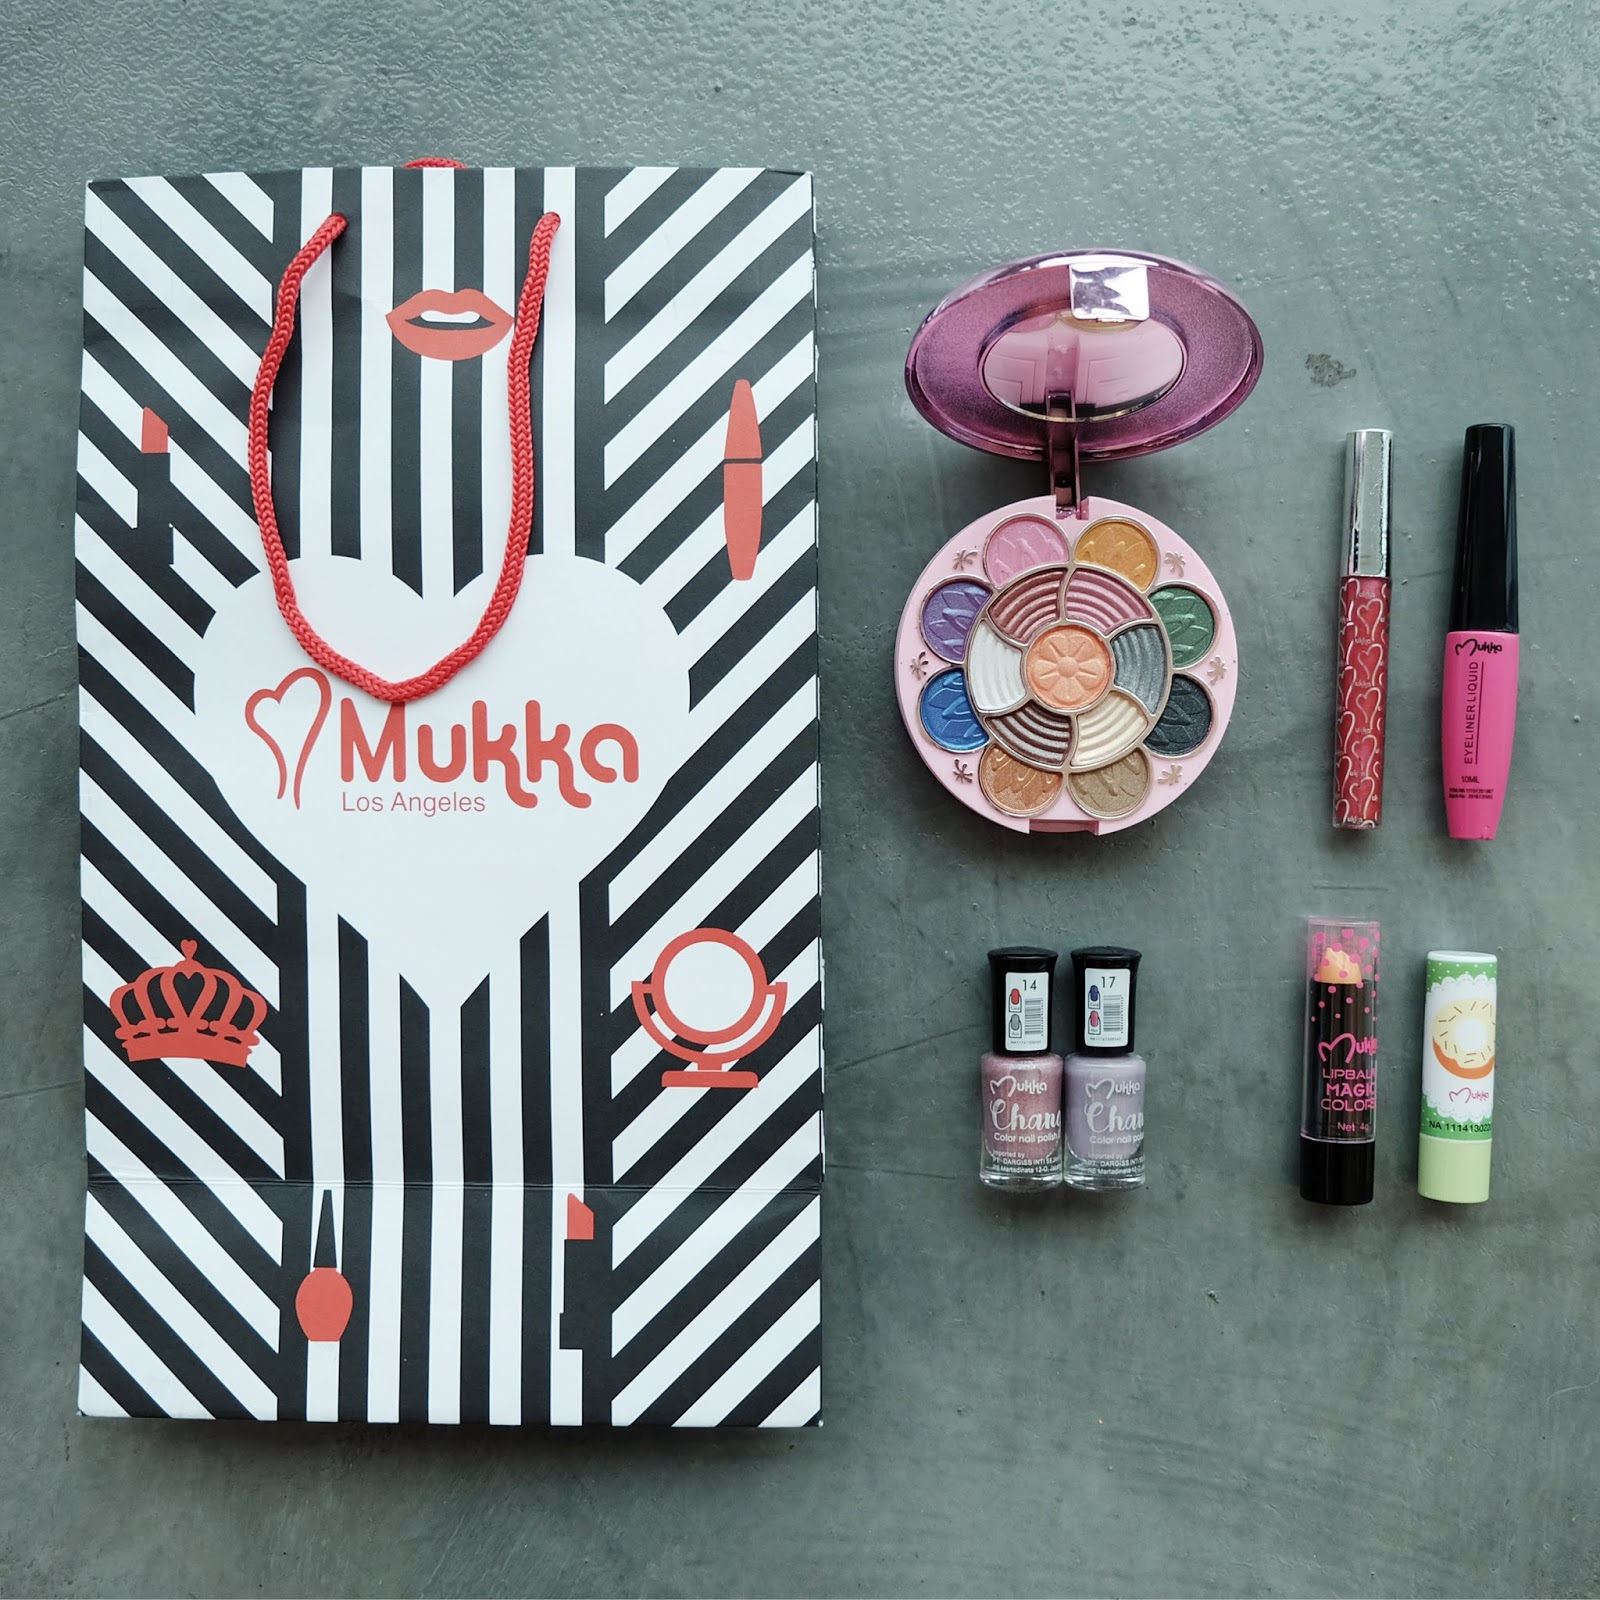 mukka kosmetik goodie bag | bigdreamerblog.com